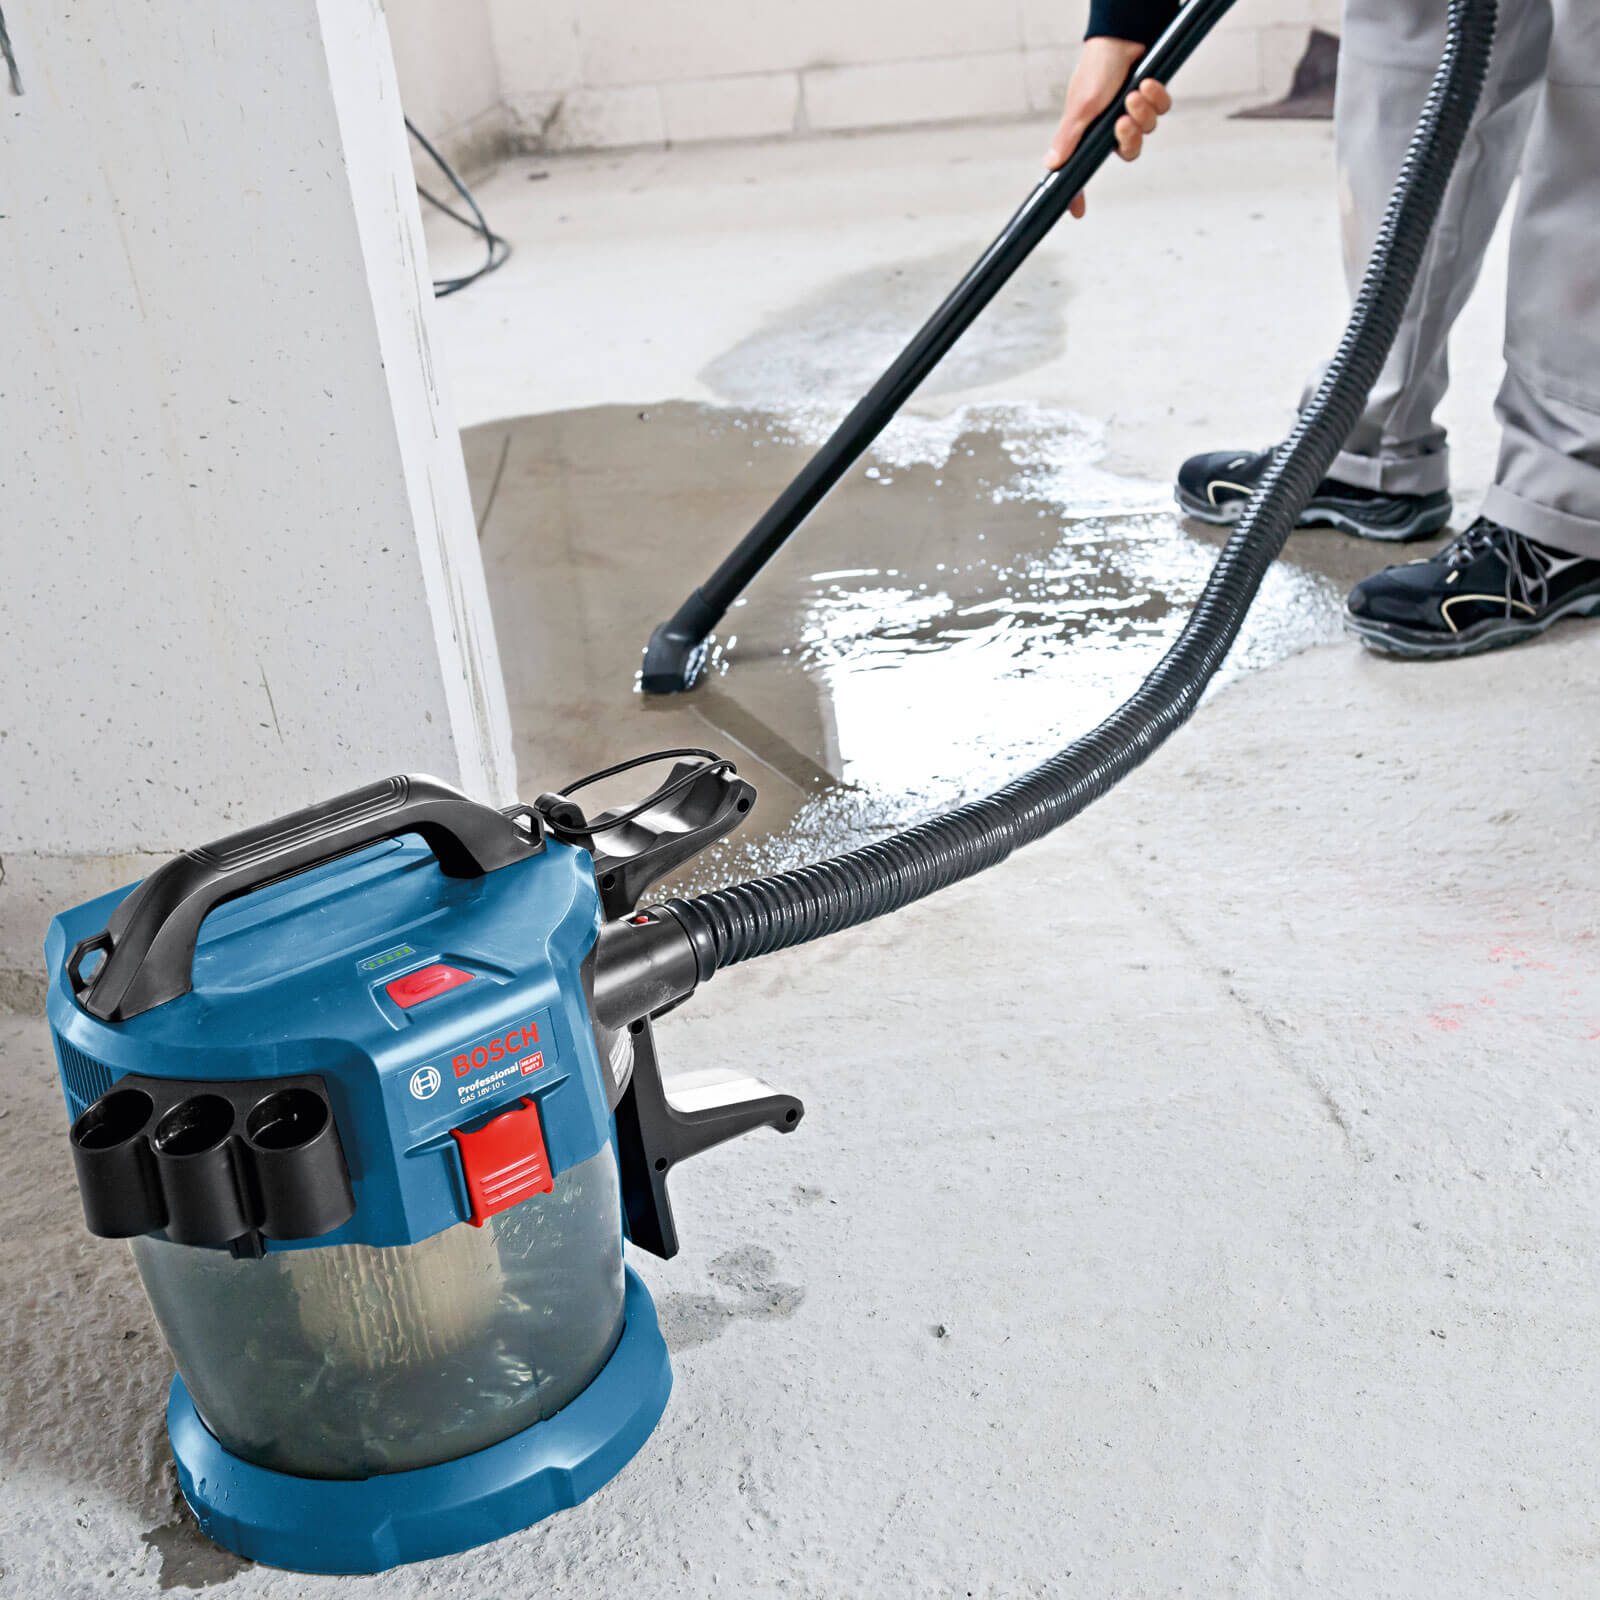 18 Volt Cordless WetDry Vacuum